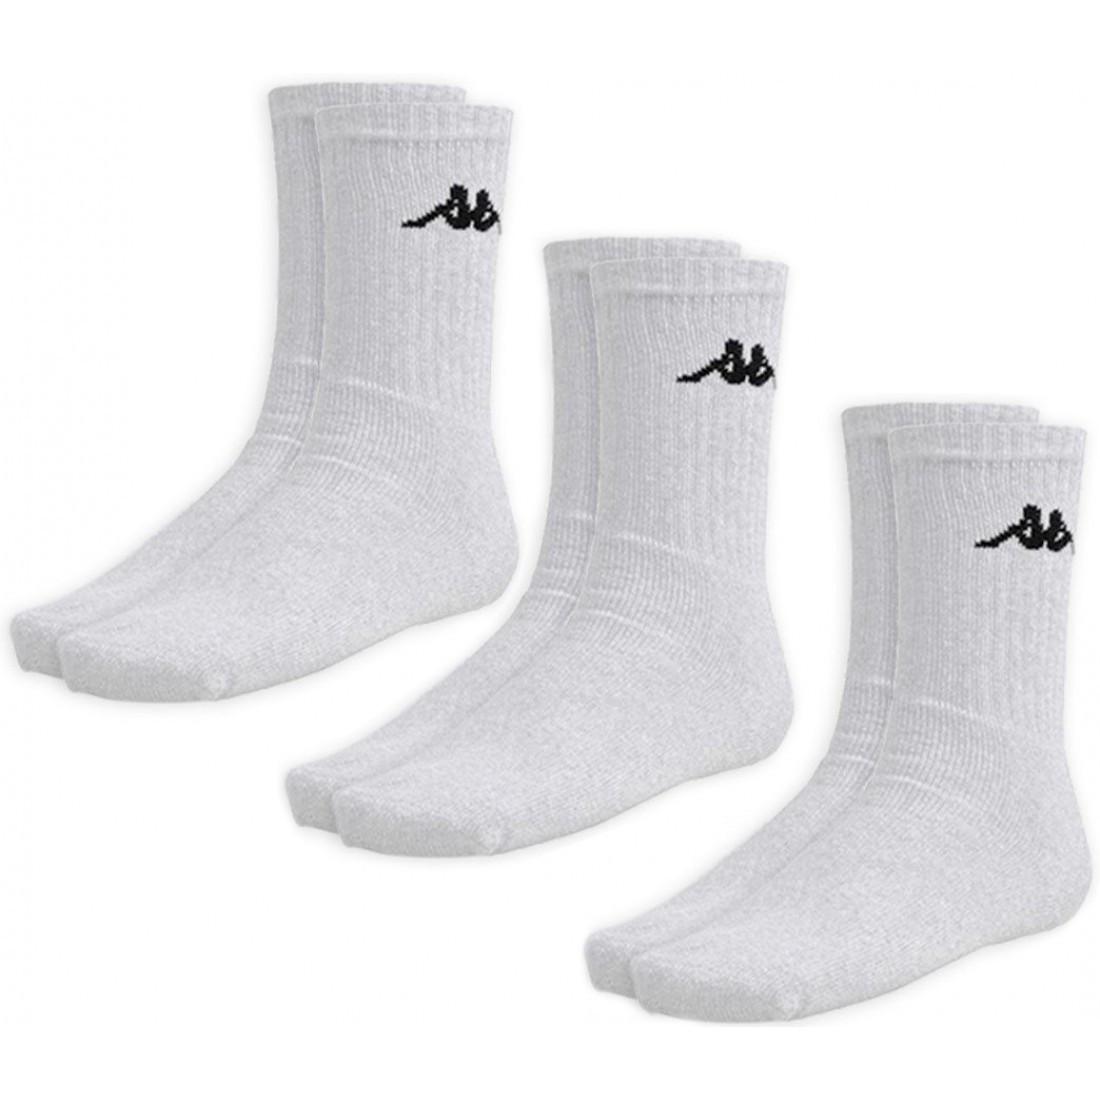 Носки Kappa socks белые (3-пары) (303WIG0901)